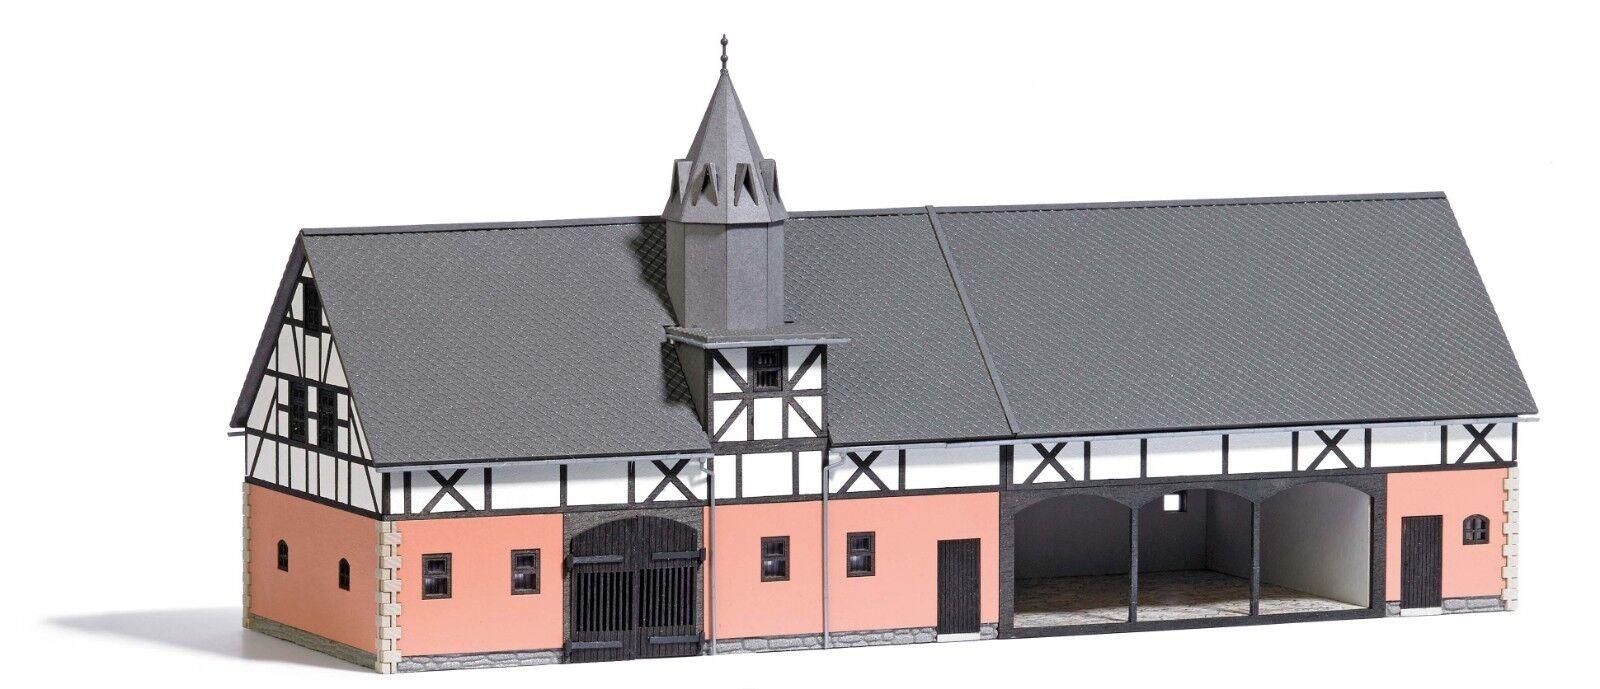 Busch 1670 Scala H0 Reitergut Sorga   Nuovo in Scatola Originale